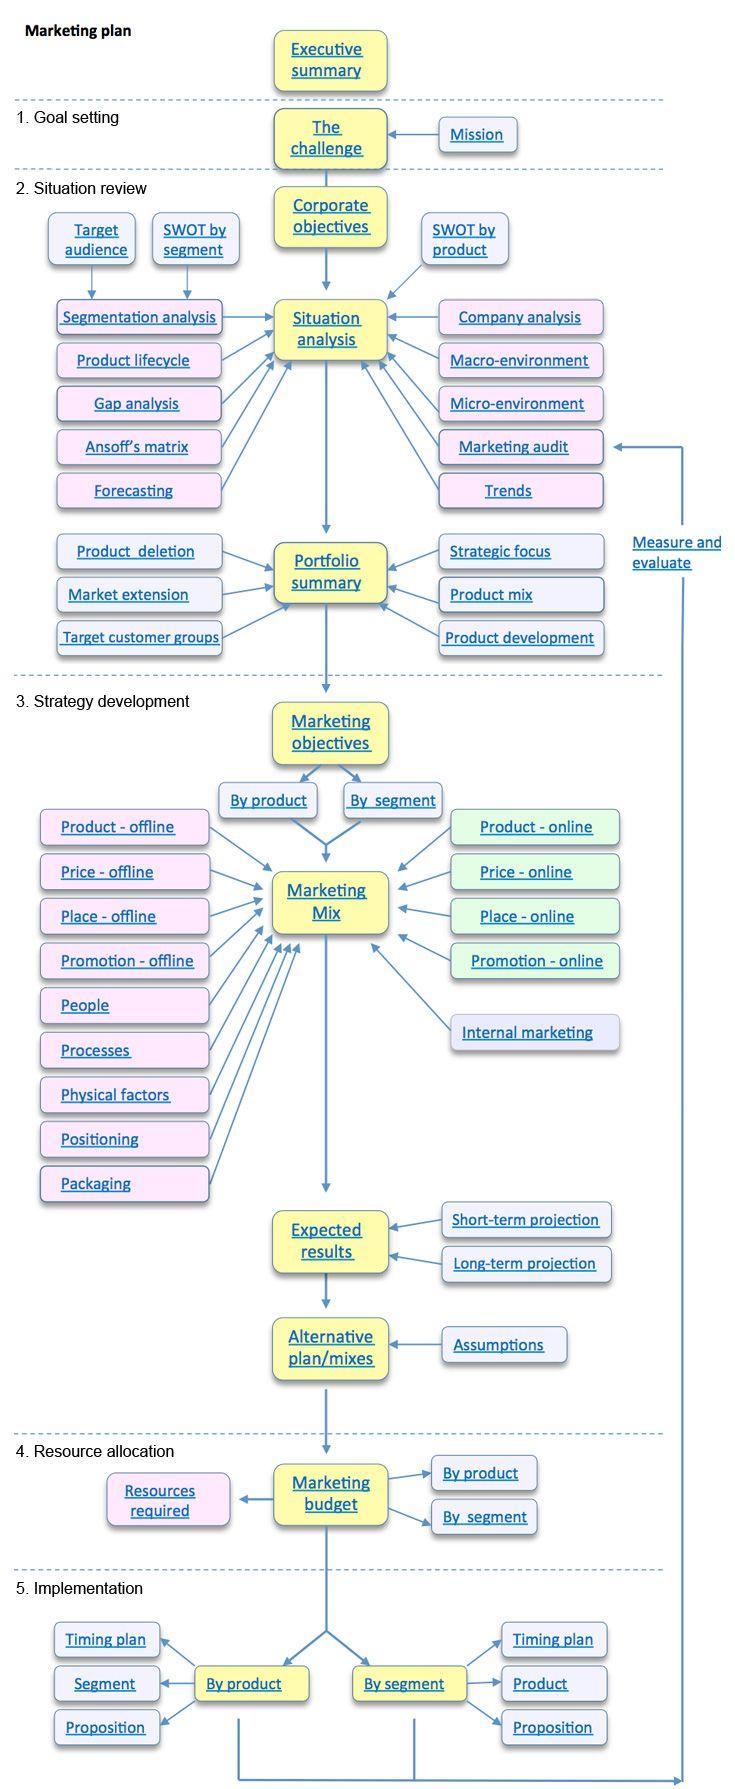 Resource Allocation Template Excel Microsoft Natural Buff Dog - Resource allocation template excel microsoft